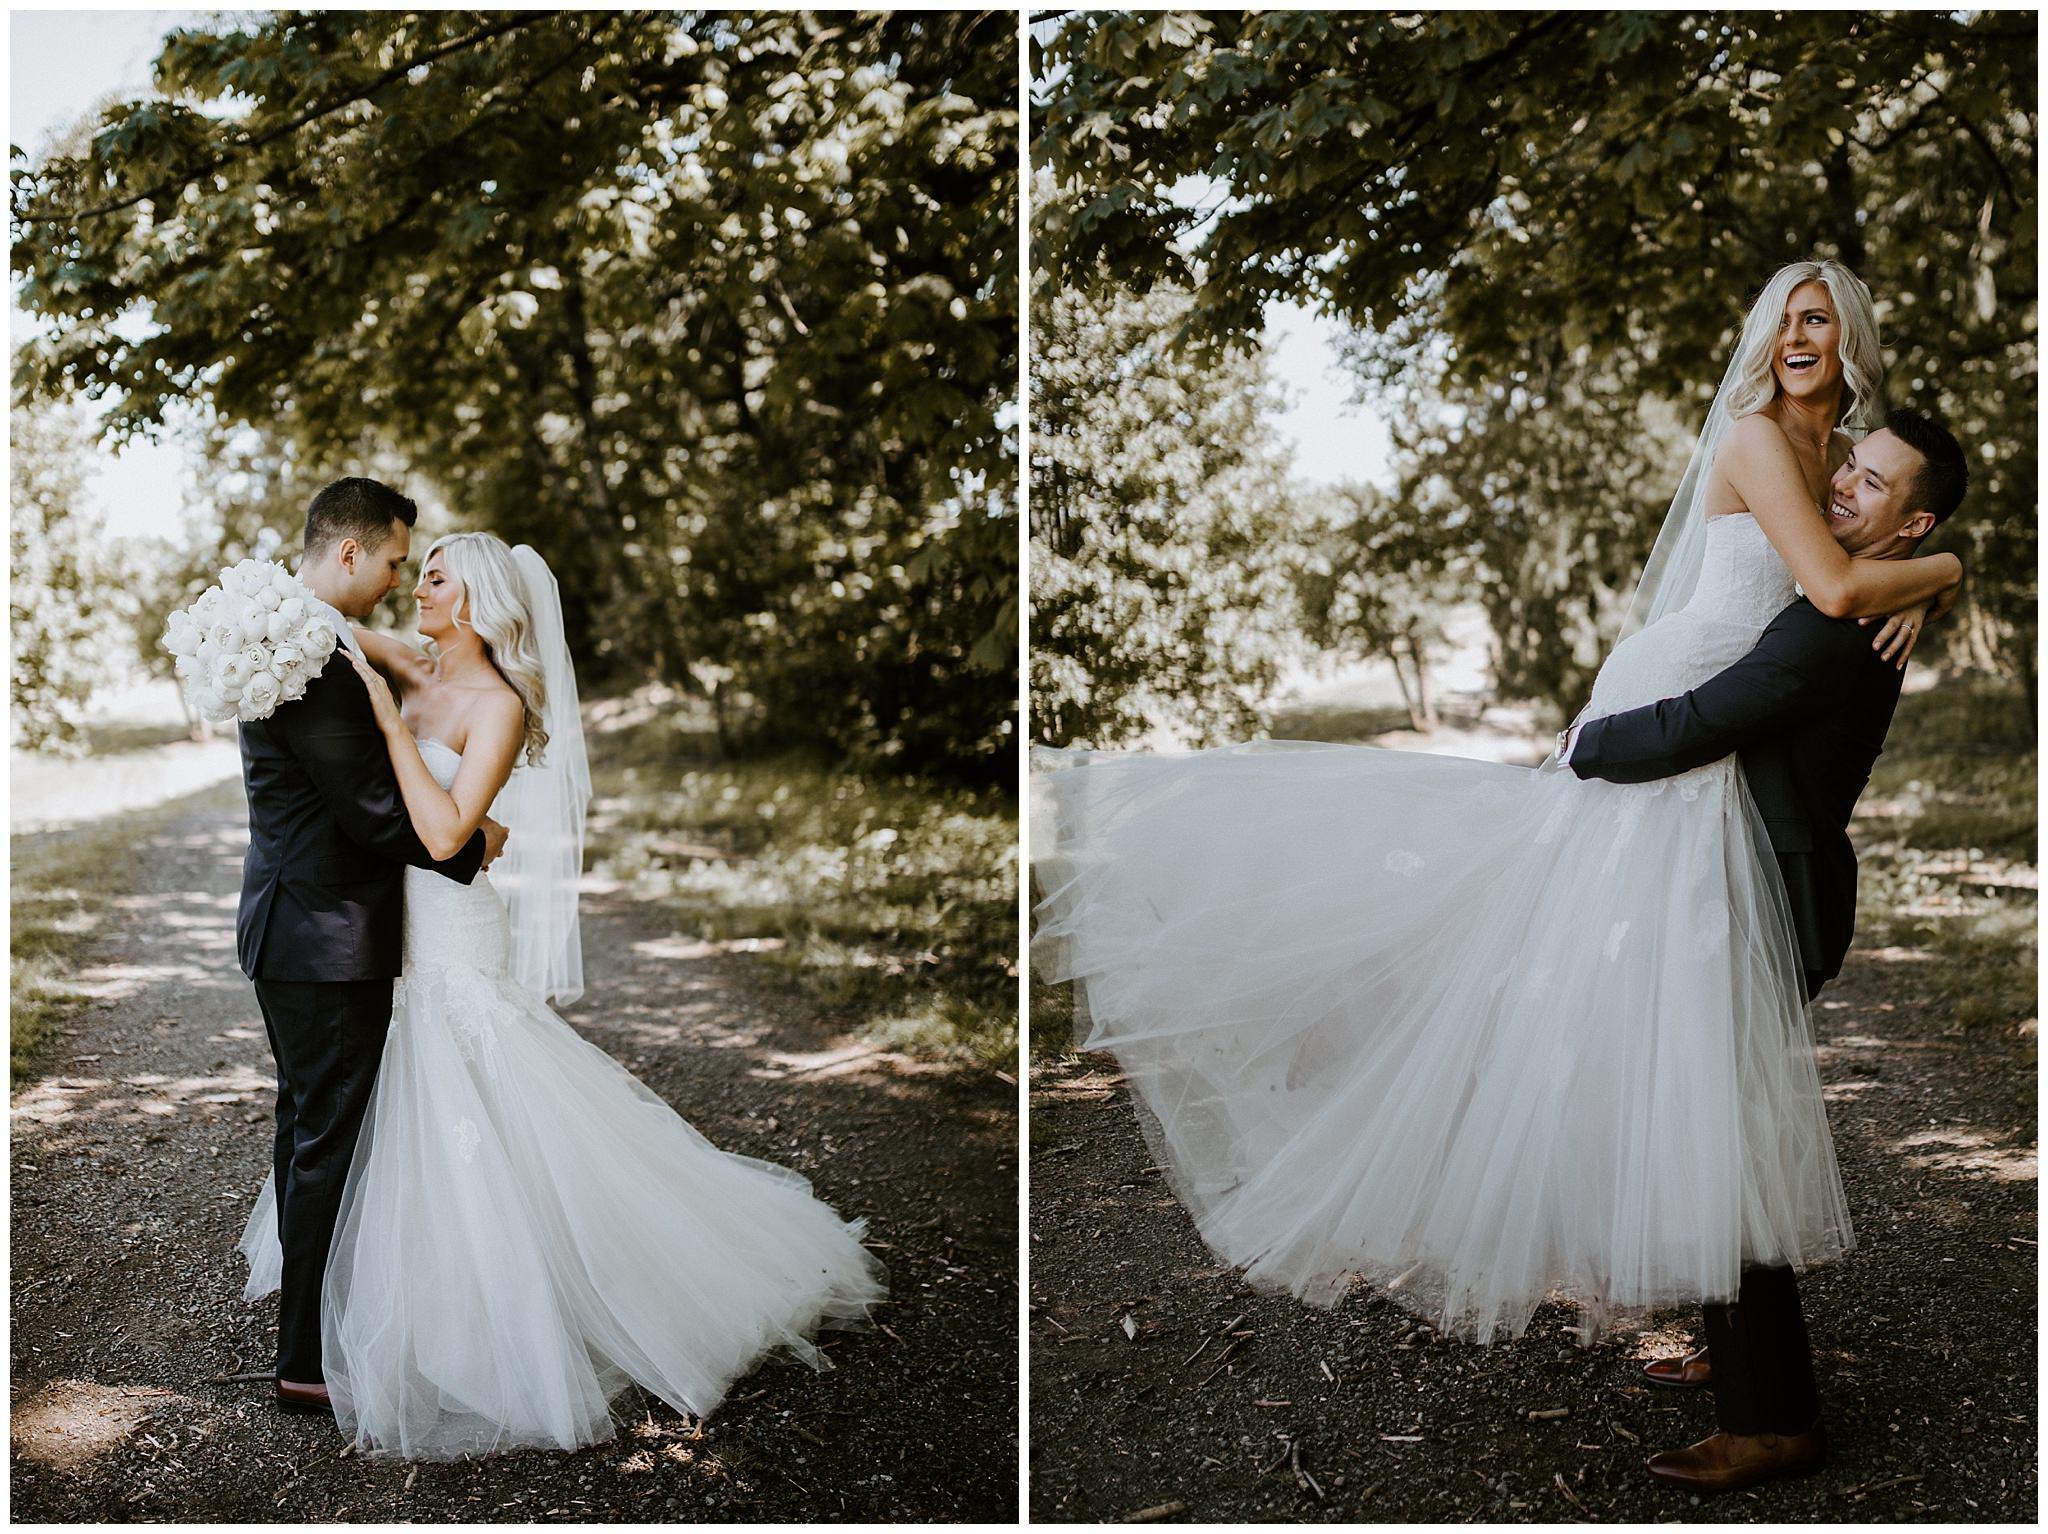 mt-lehman-winery-wedding-abbotsford-29.JPG